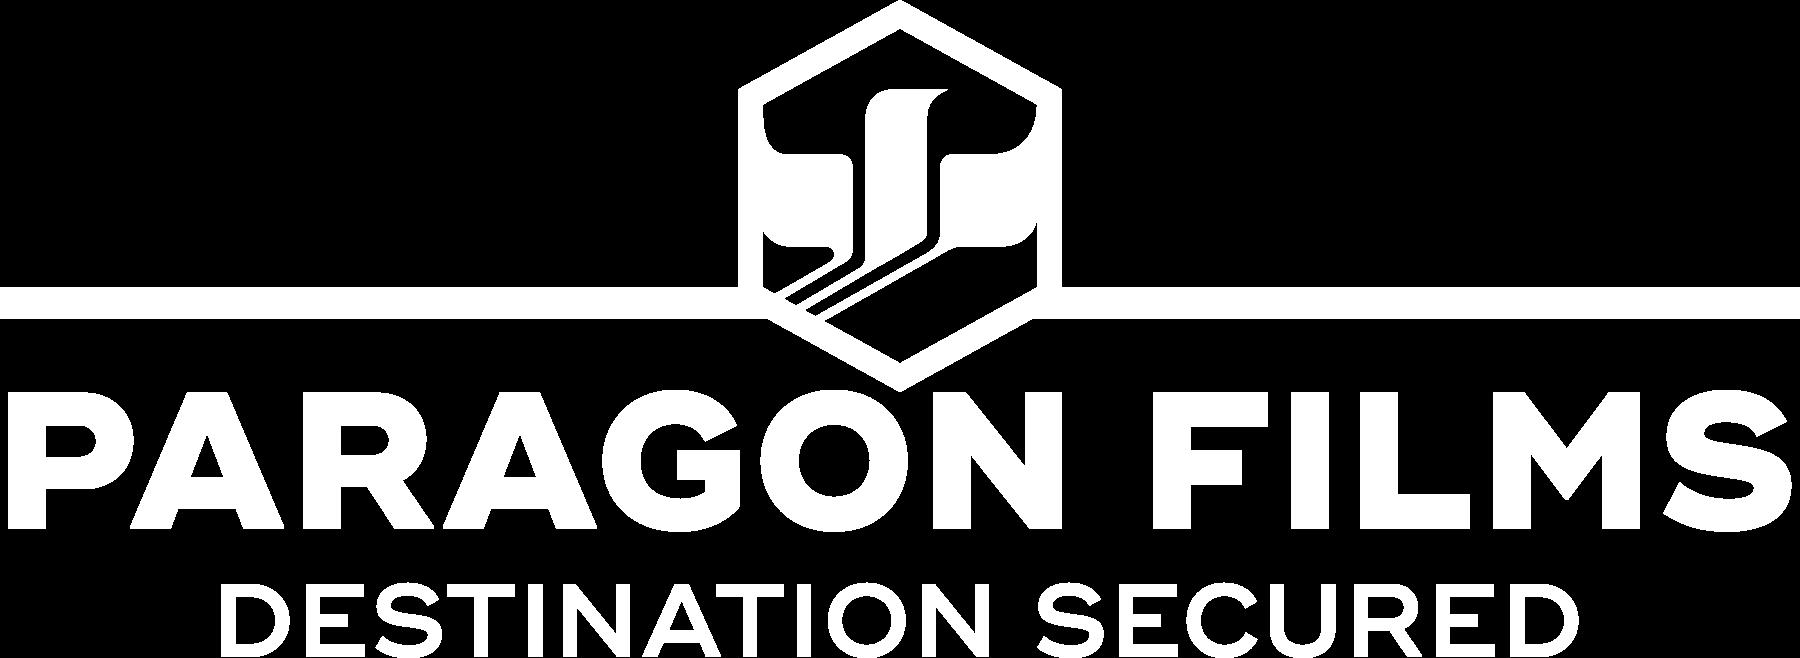 Paragon Films - Destination Secured